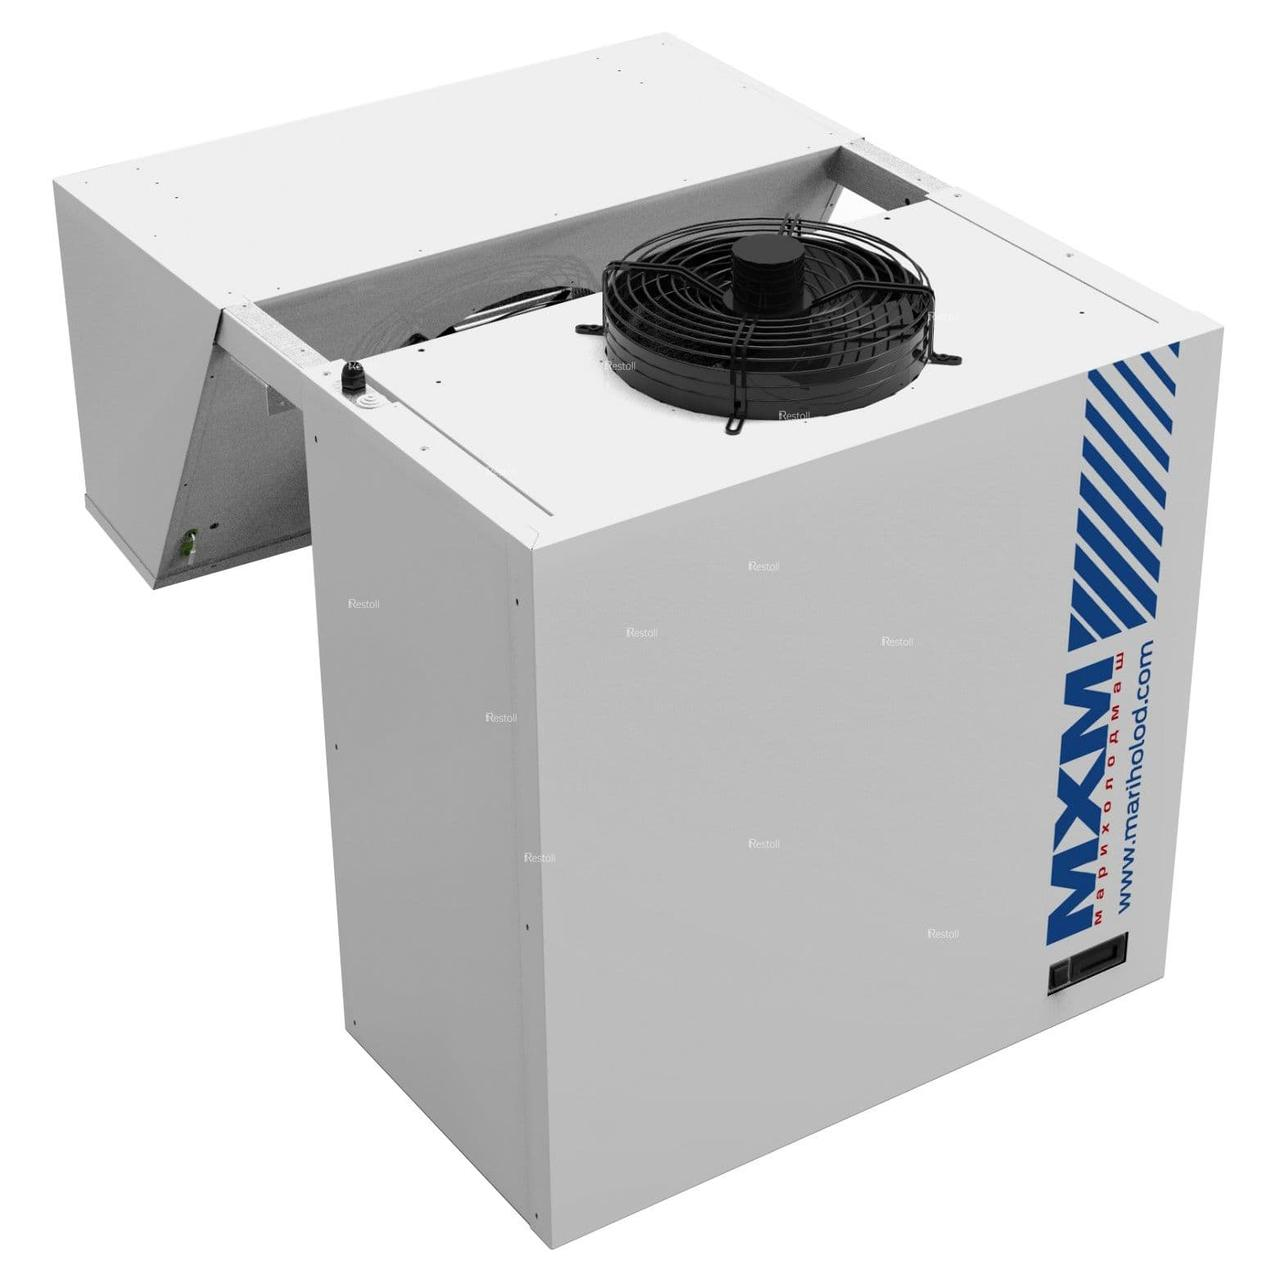 Моноблок низкотемпературный Марихолодмаш LMN 331